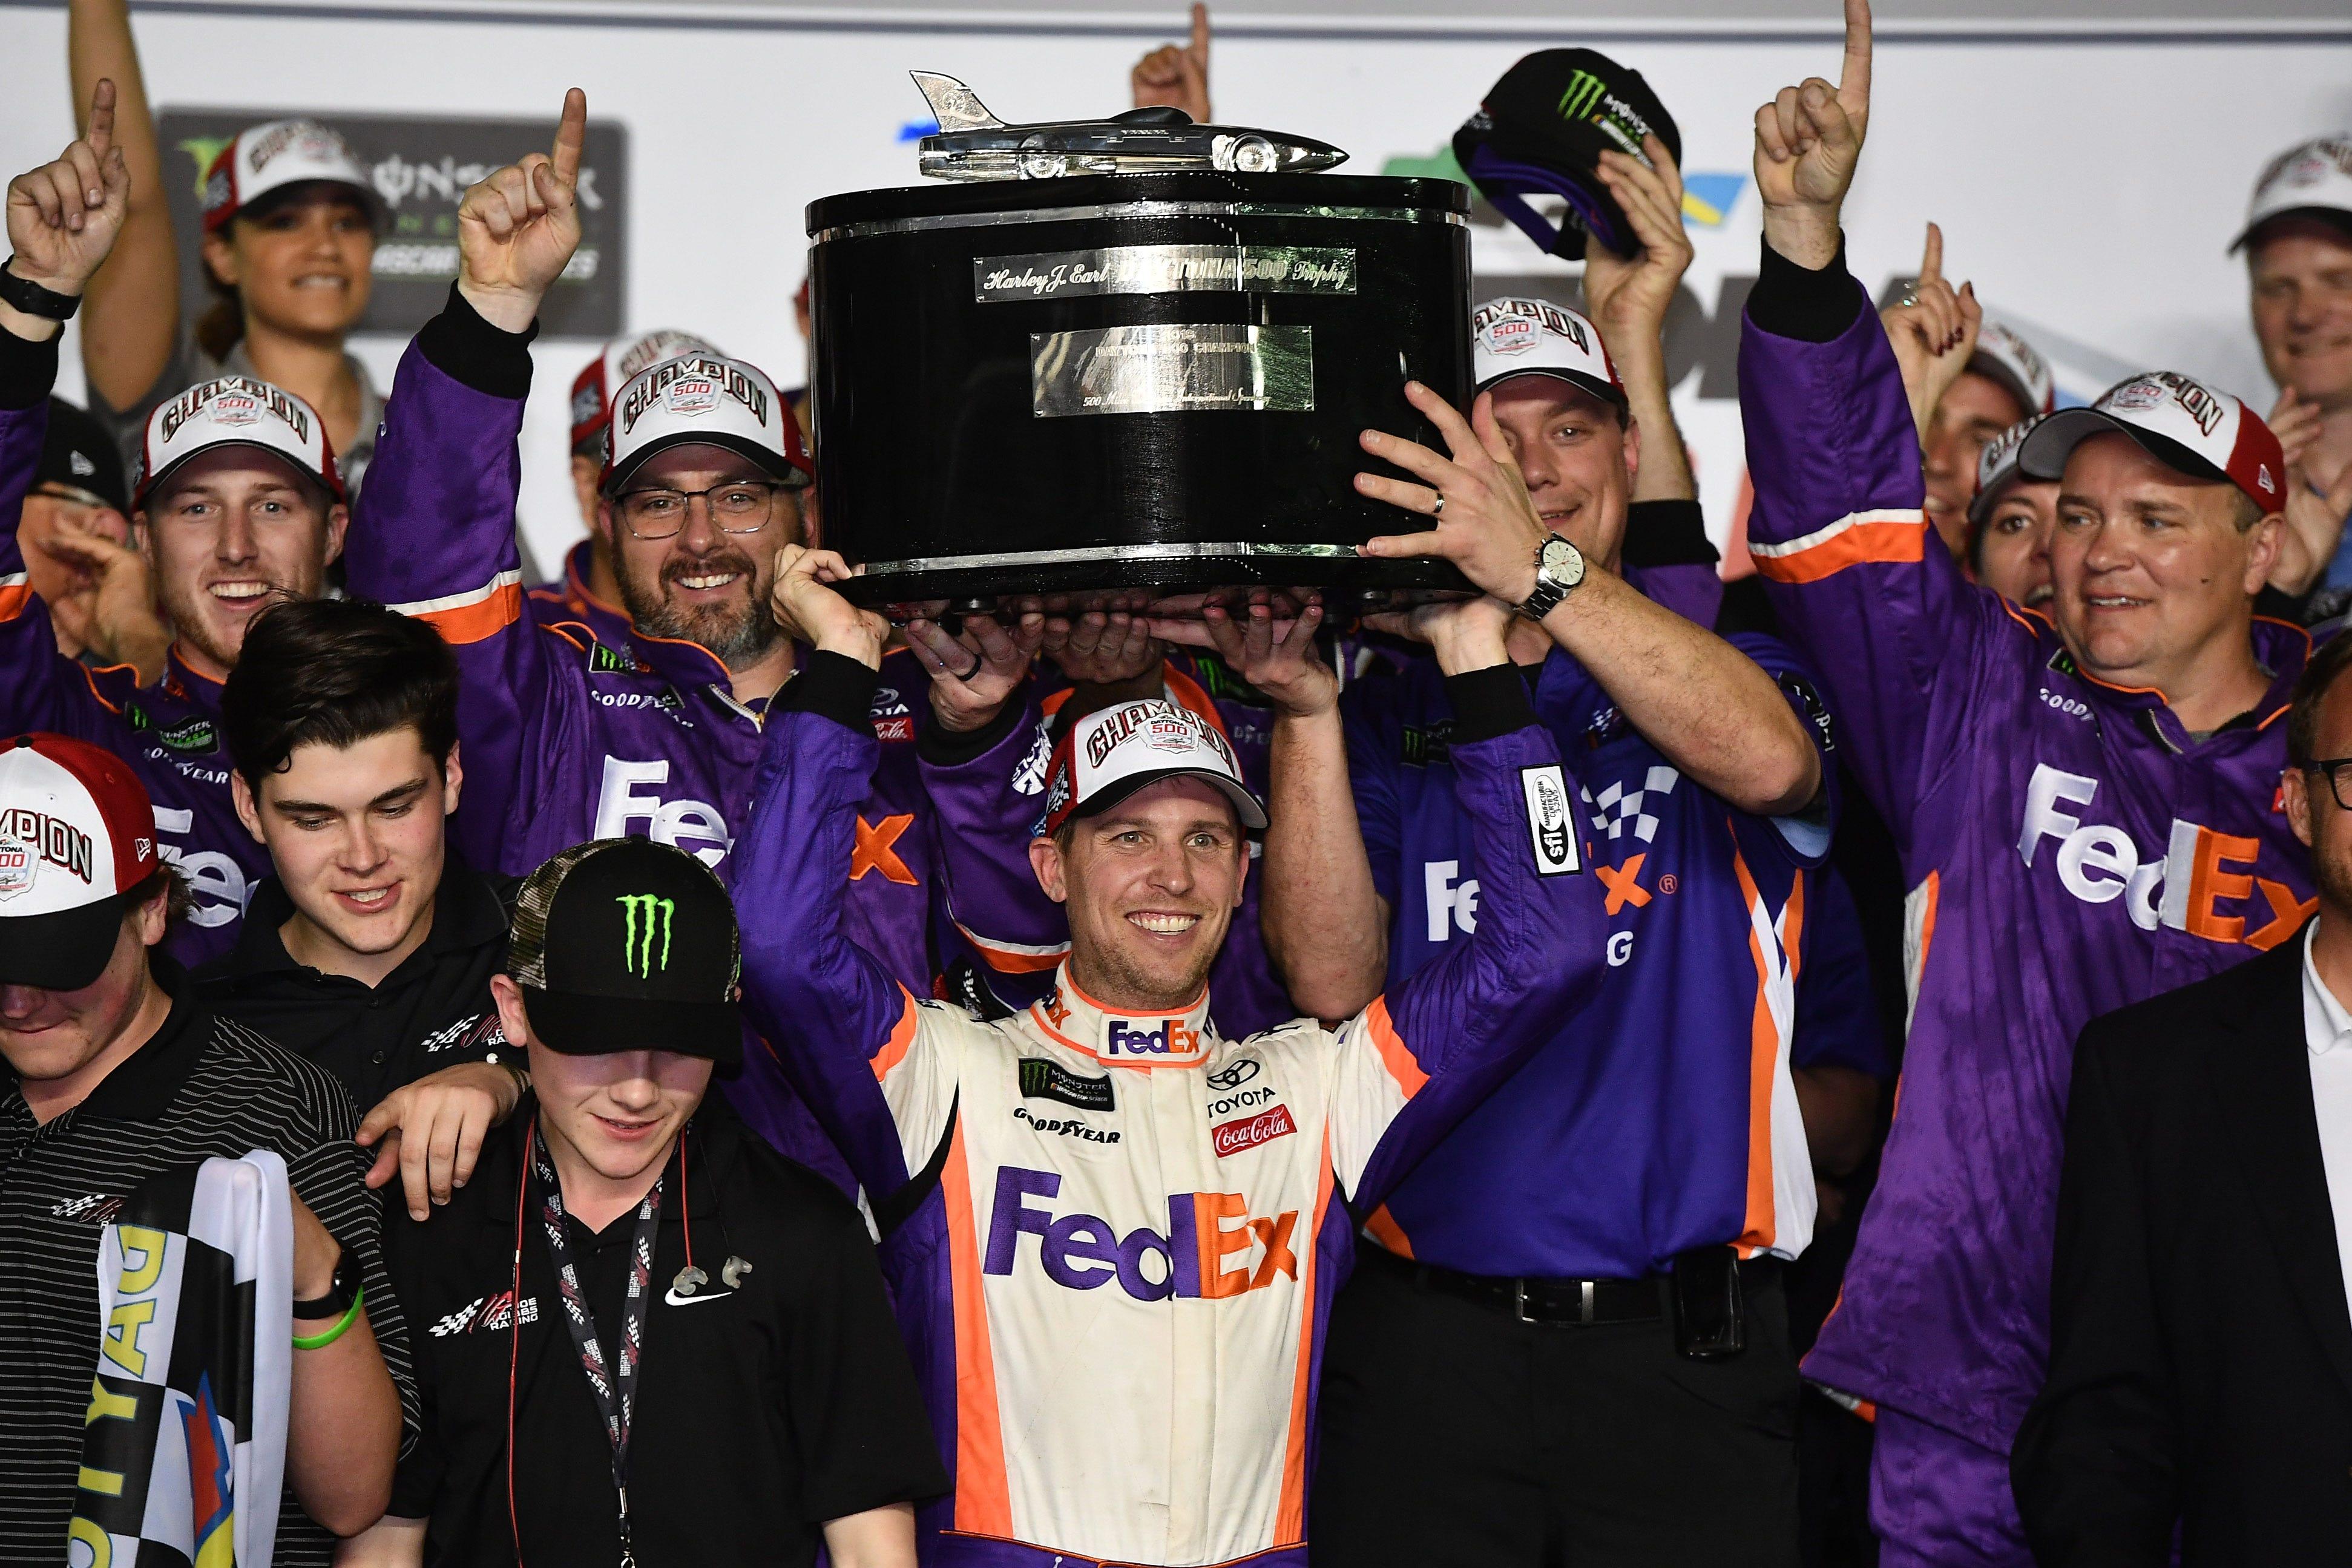 Denny Hamlin's Daytona 500 win provides emotional tribute to deceased J.D. Gibbs